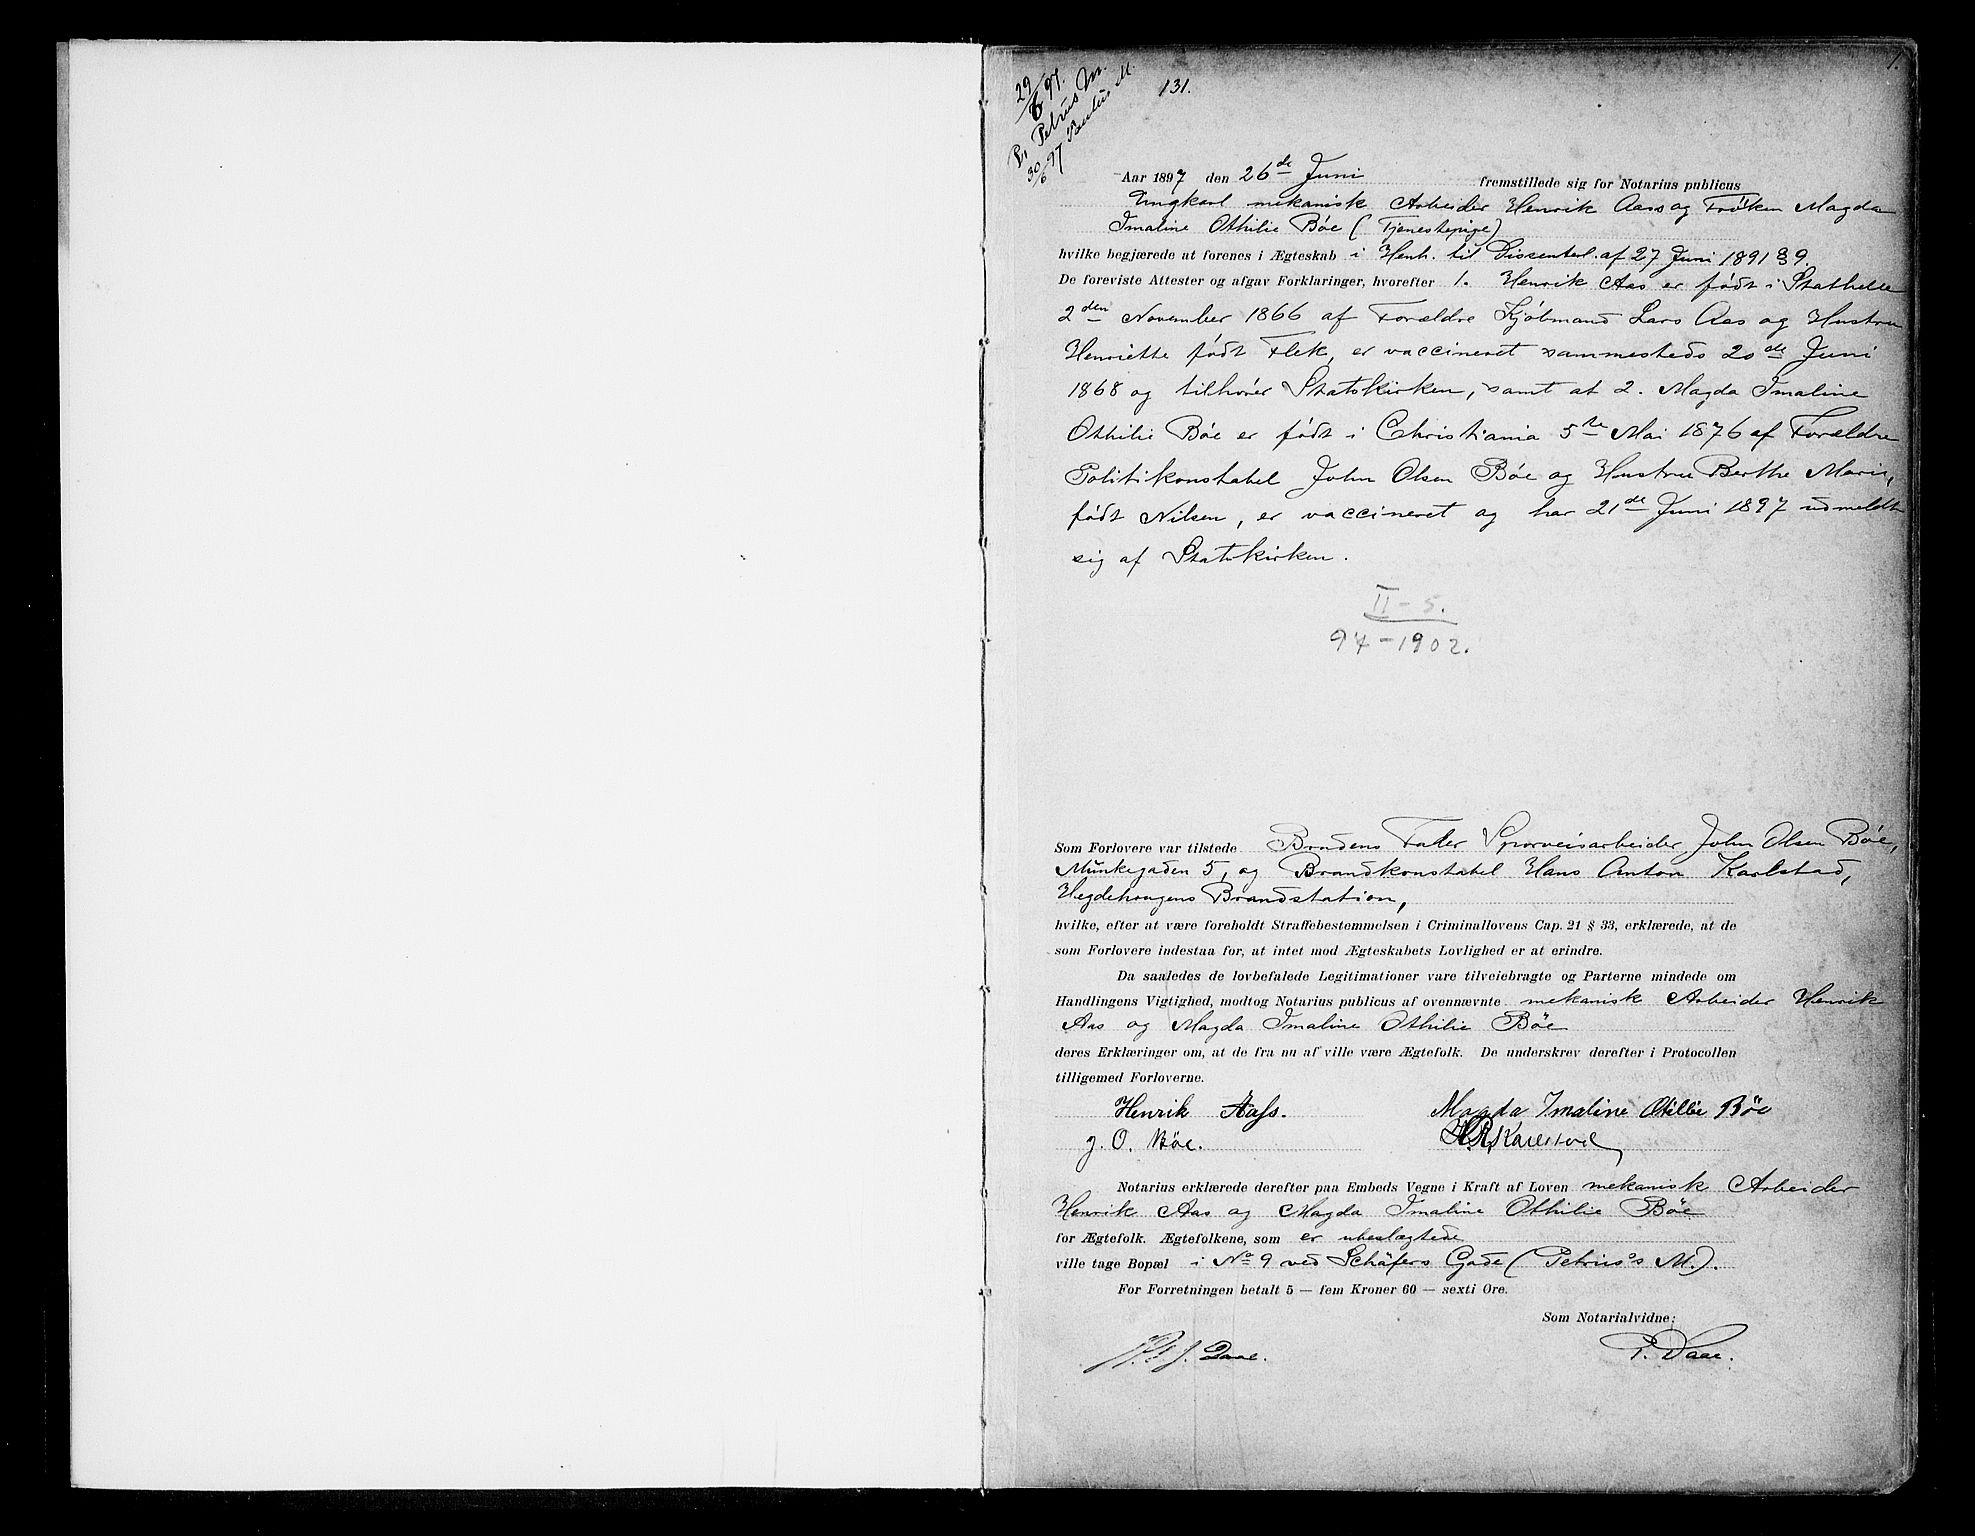 SAO, Oslo byfogd avd. I, L/Lb/Lbb/L0005: Notarialprotokoll, rekke II: Vigsler, 1897-1902, s. 1a